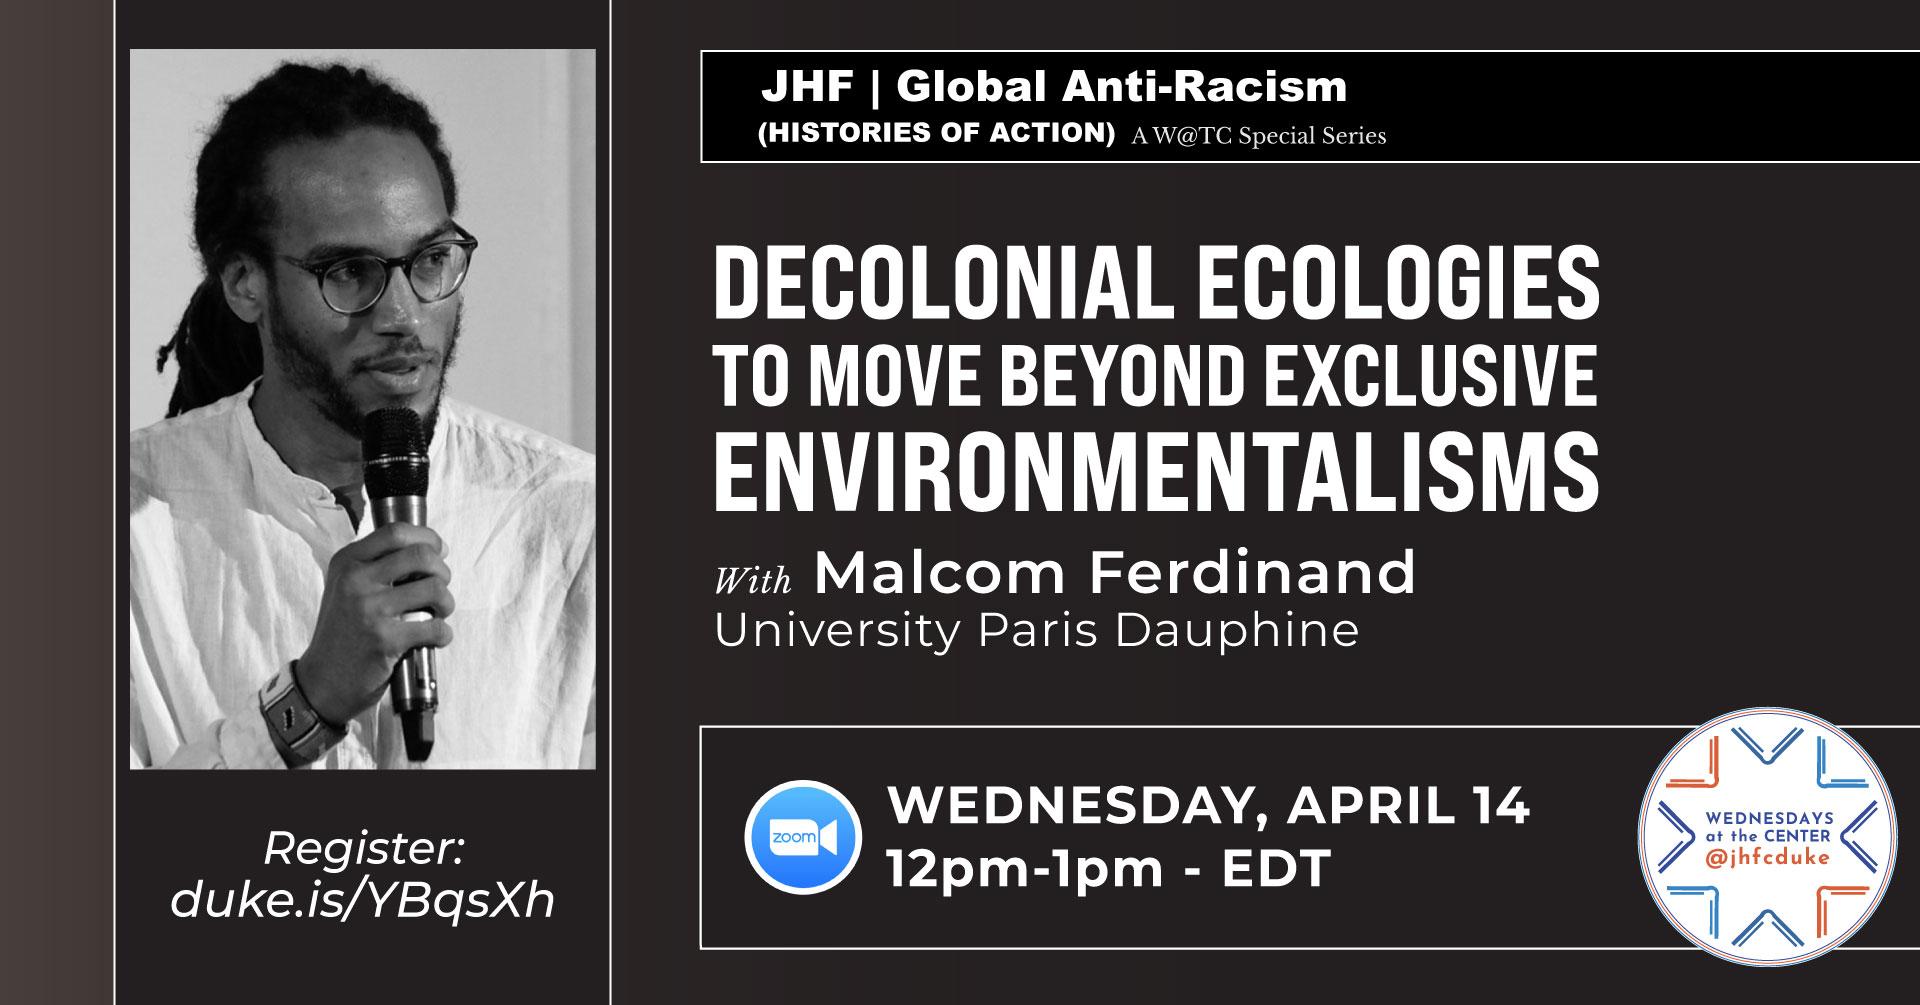 Malcom Ferdinand: Decolonial Ecologies, Duke University, Wednesdays at the Center, April 14, 2021